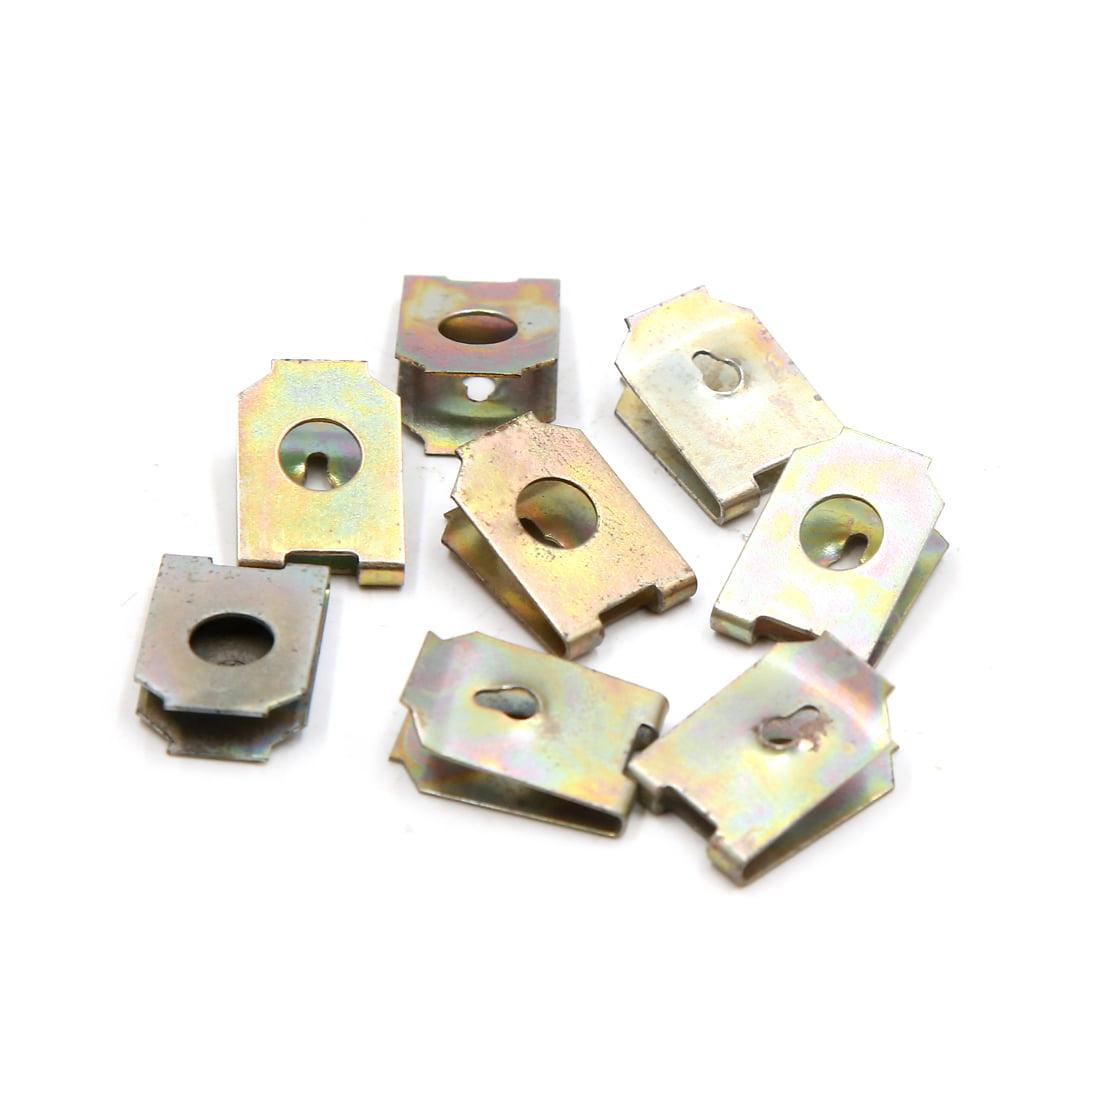 8Pcs 6mm Hole Dia Metal Rivets U-Type Clips Retainers Car Bumper Fastener